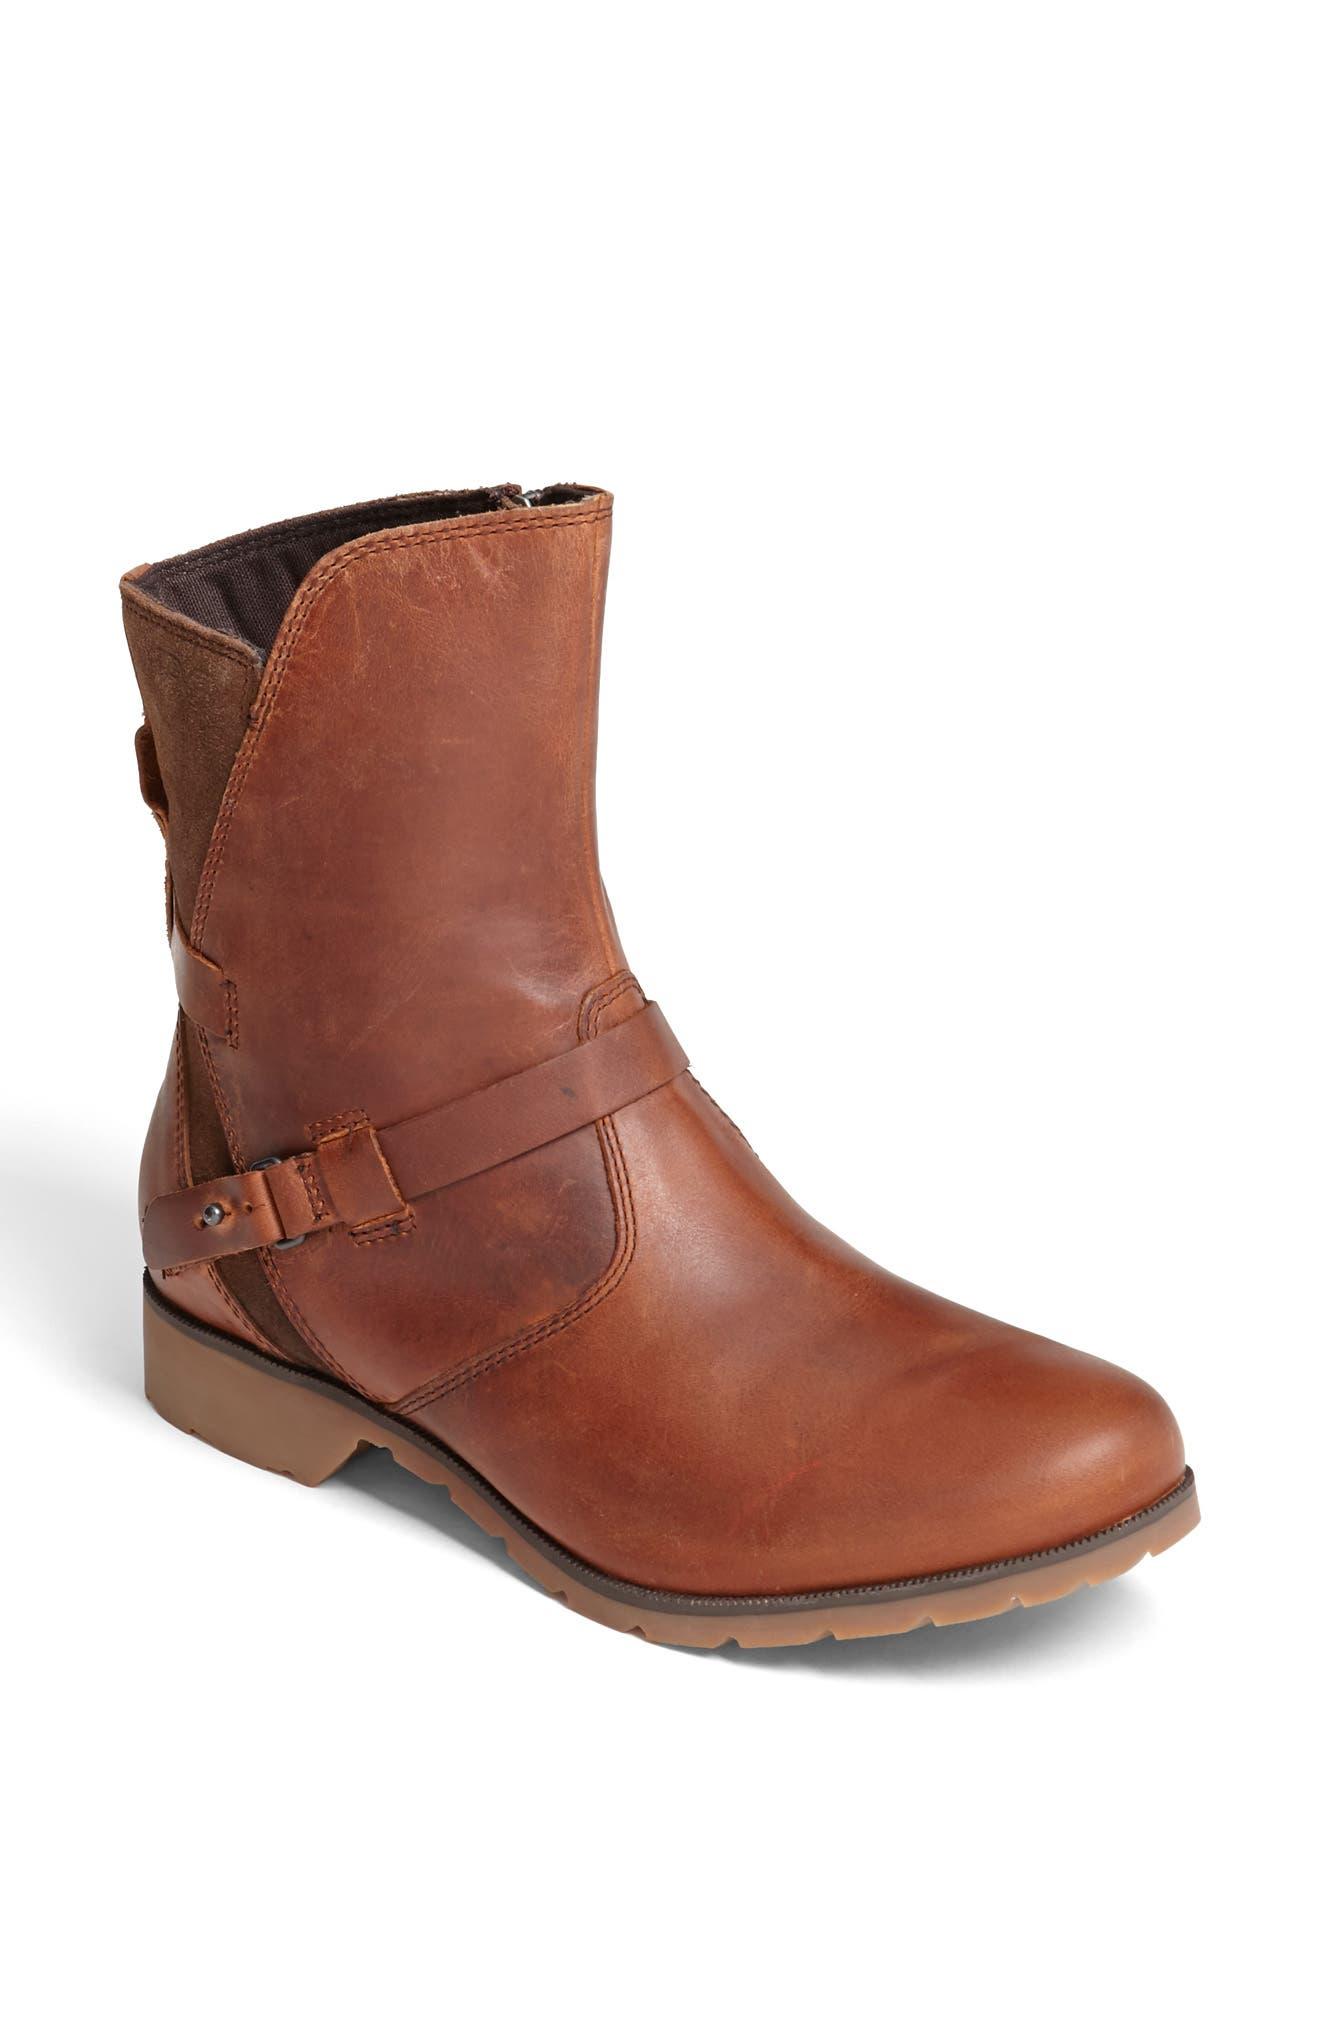 Alternate Image 1 Selected - Teva 'De La Vina' Boot